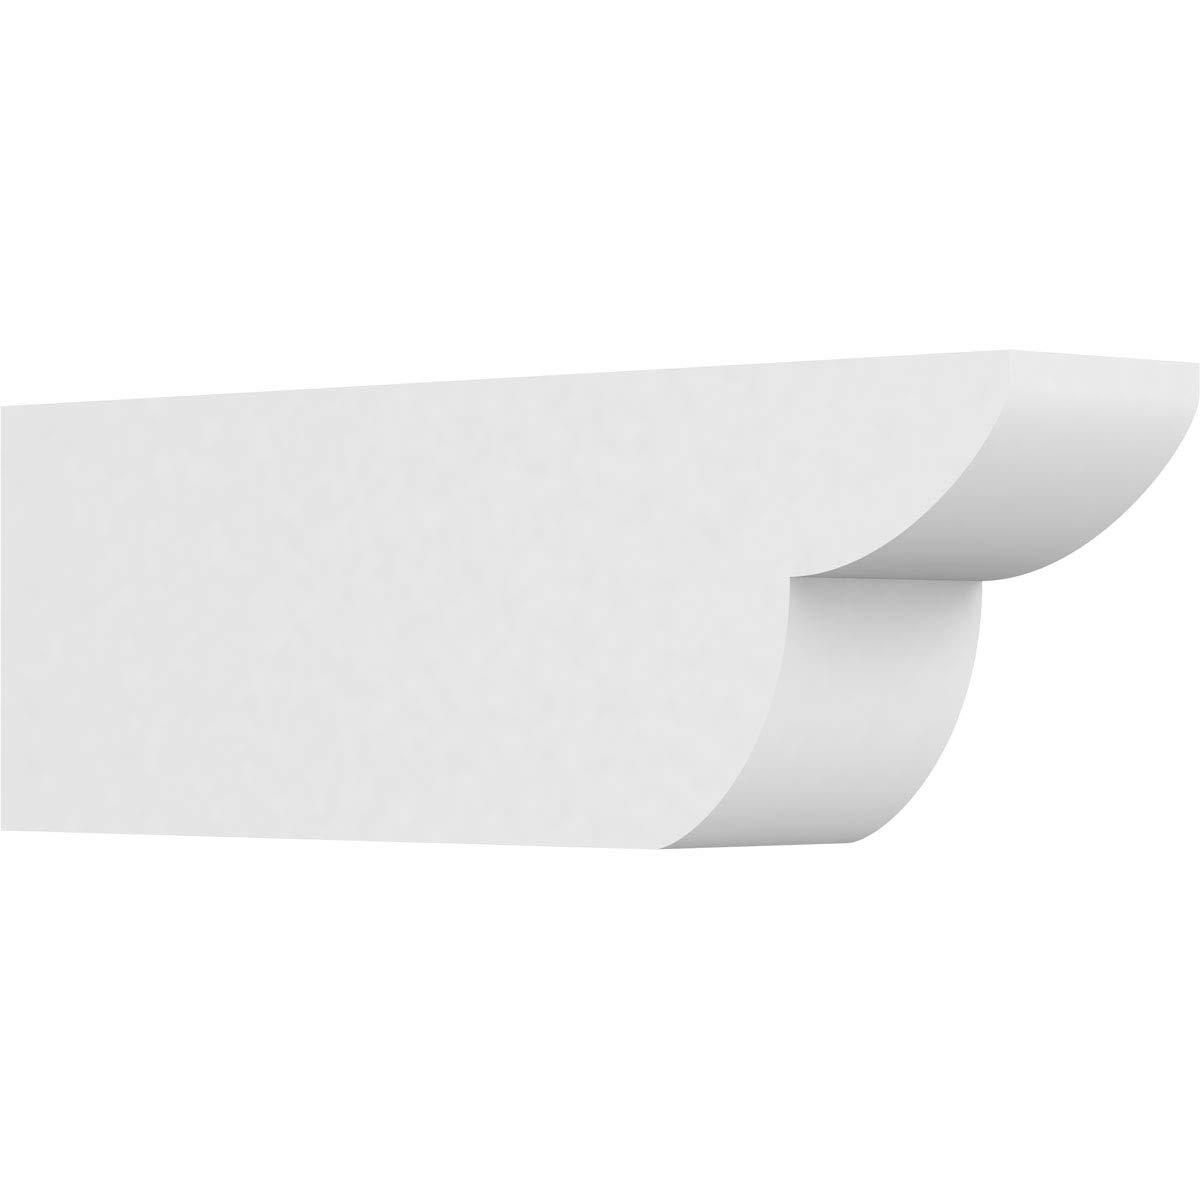 Ekena Millwork RFTP05X08X24CRE Crestline Architectural Grade PVC Rafter Tail, 5''W X 8''H X 24''L, Ivory by Ekena Millwork